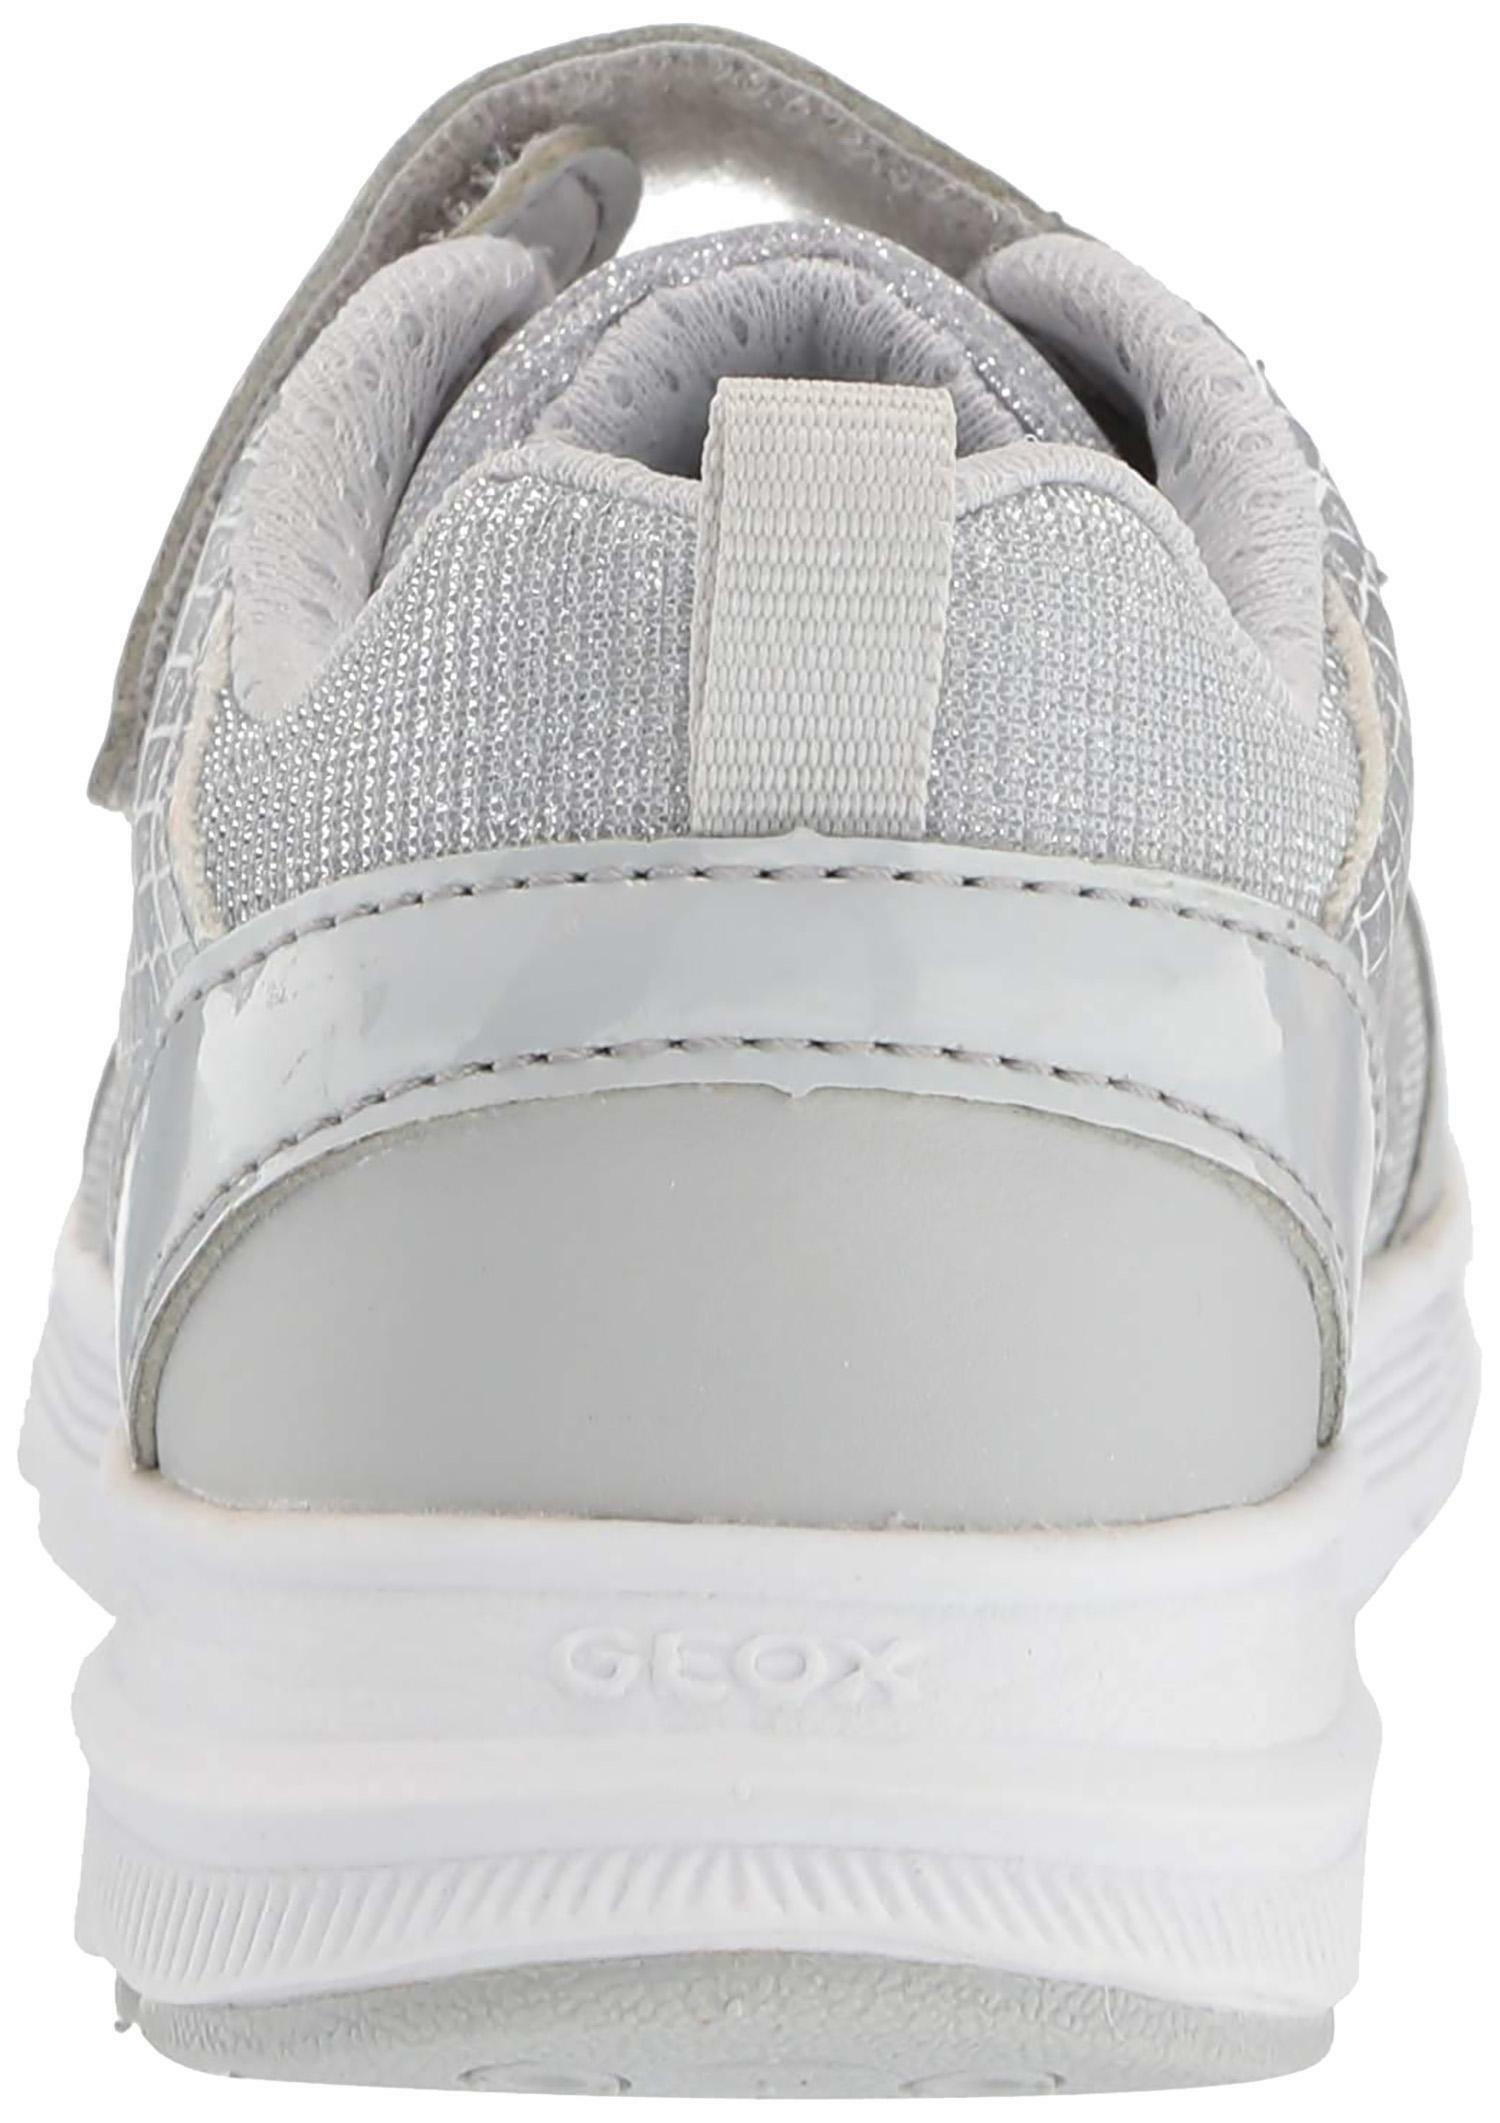 Geox j hoshiko g scarpe bambina grigie j844sbc1010